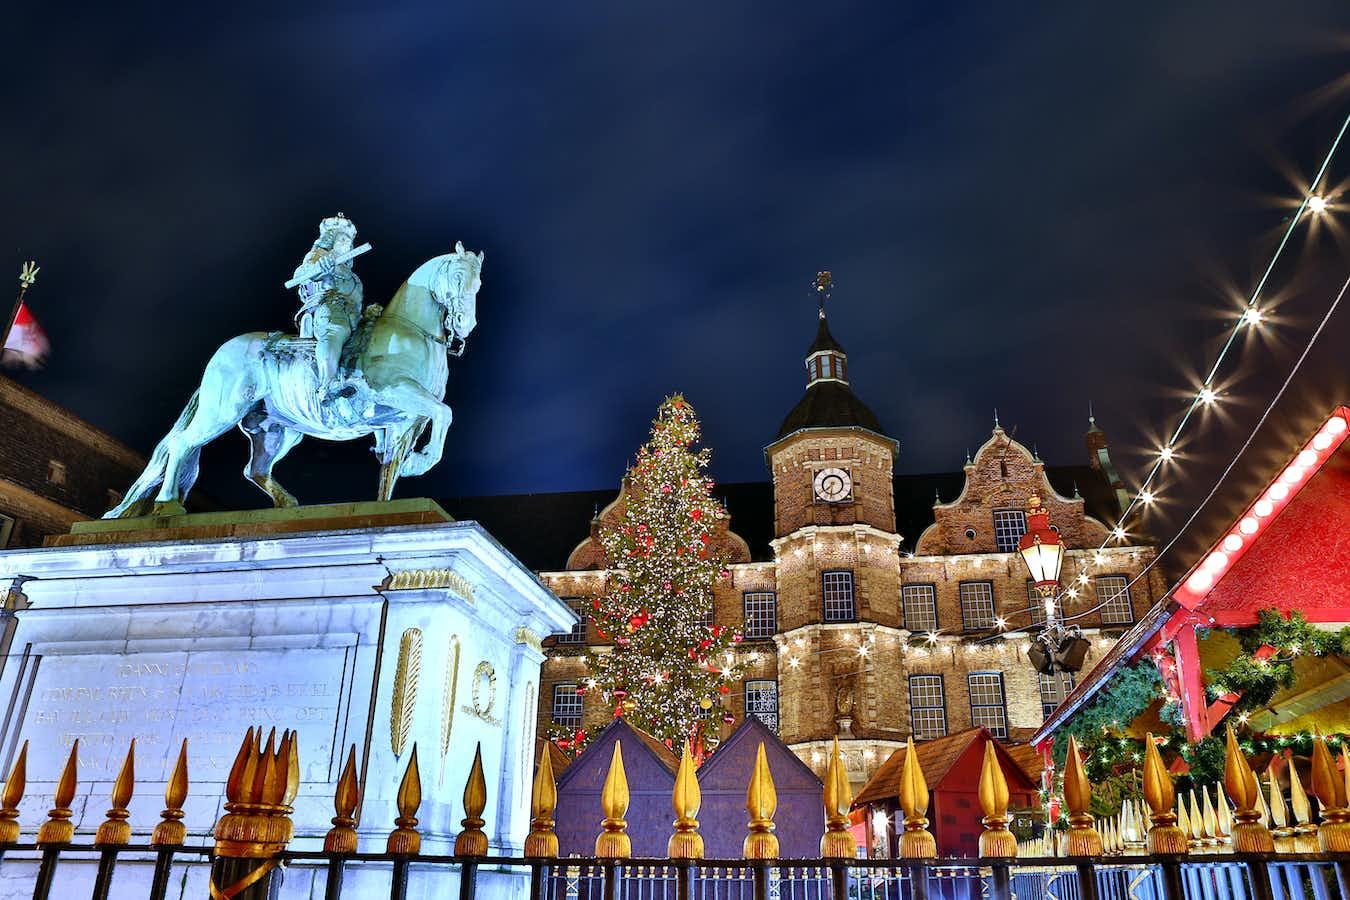 4-Star Düsseldorf & Cologne Christmas Markets